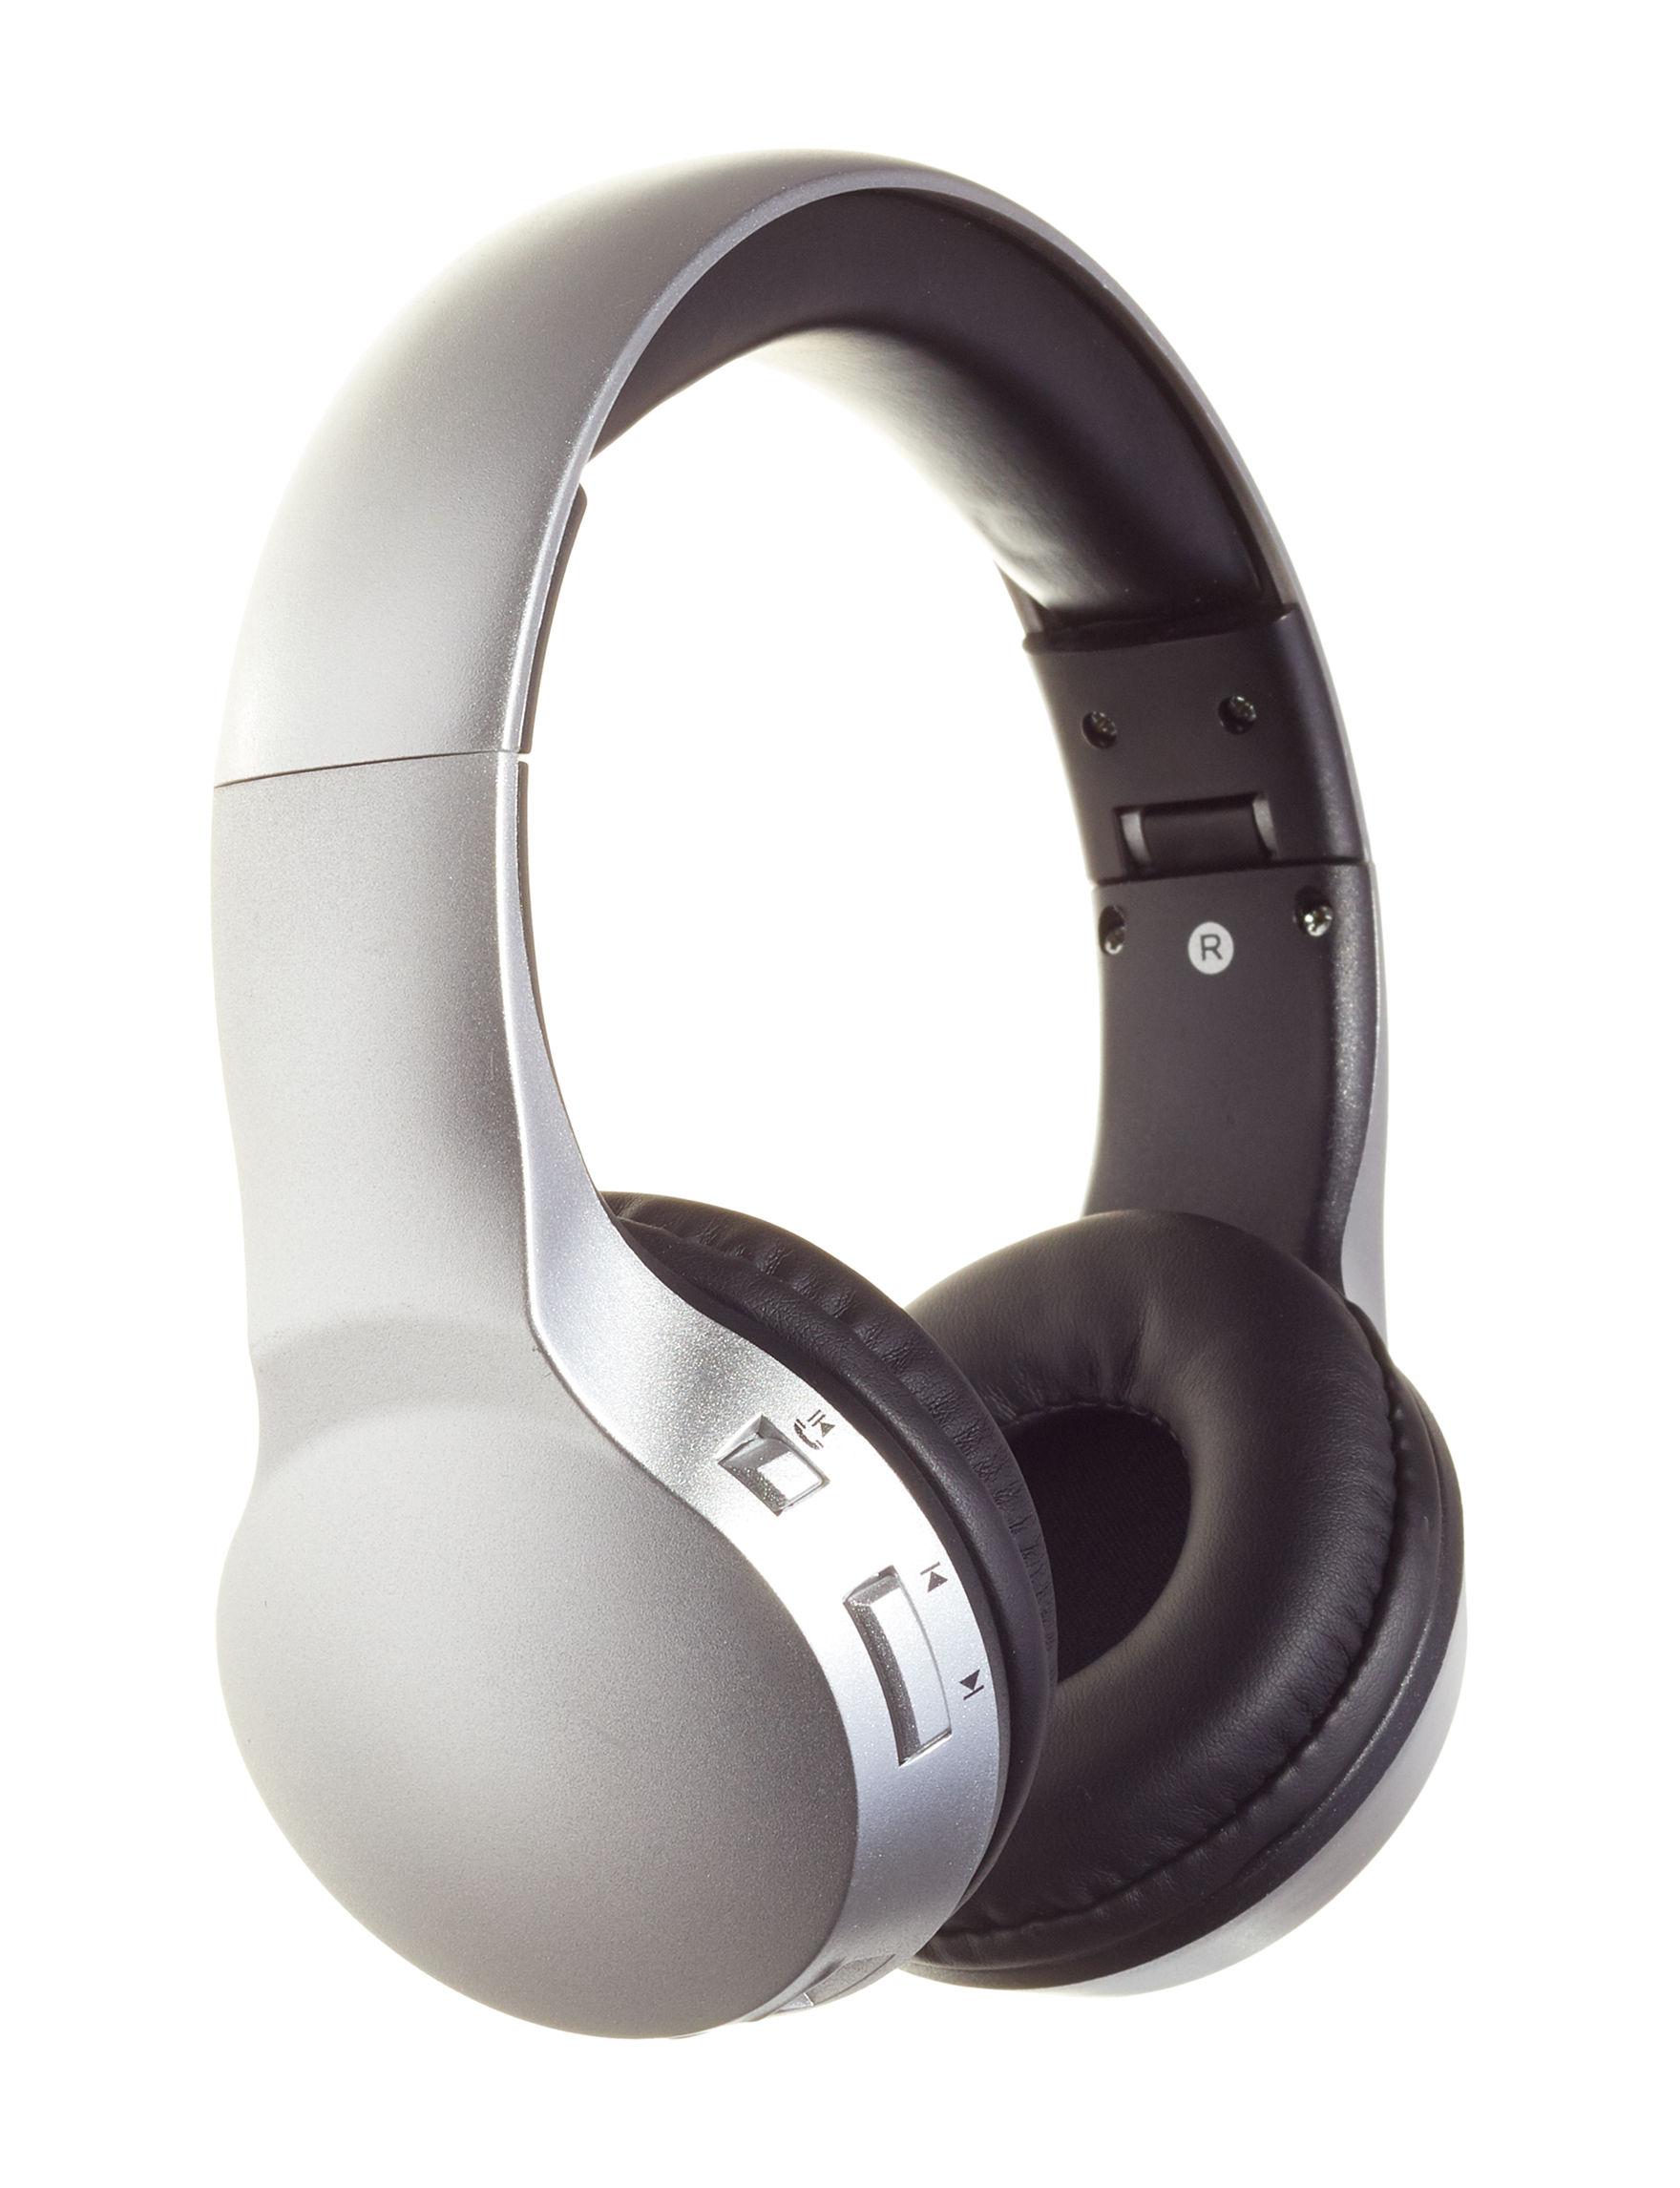 Sharper Image Black Headphones Tech Accessories